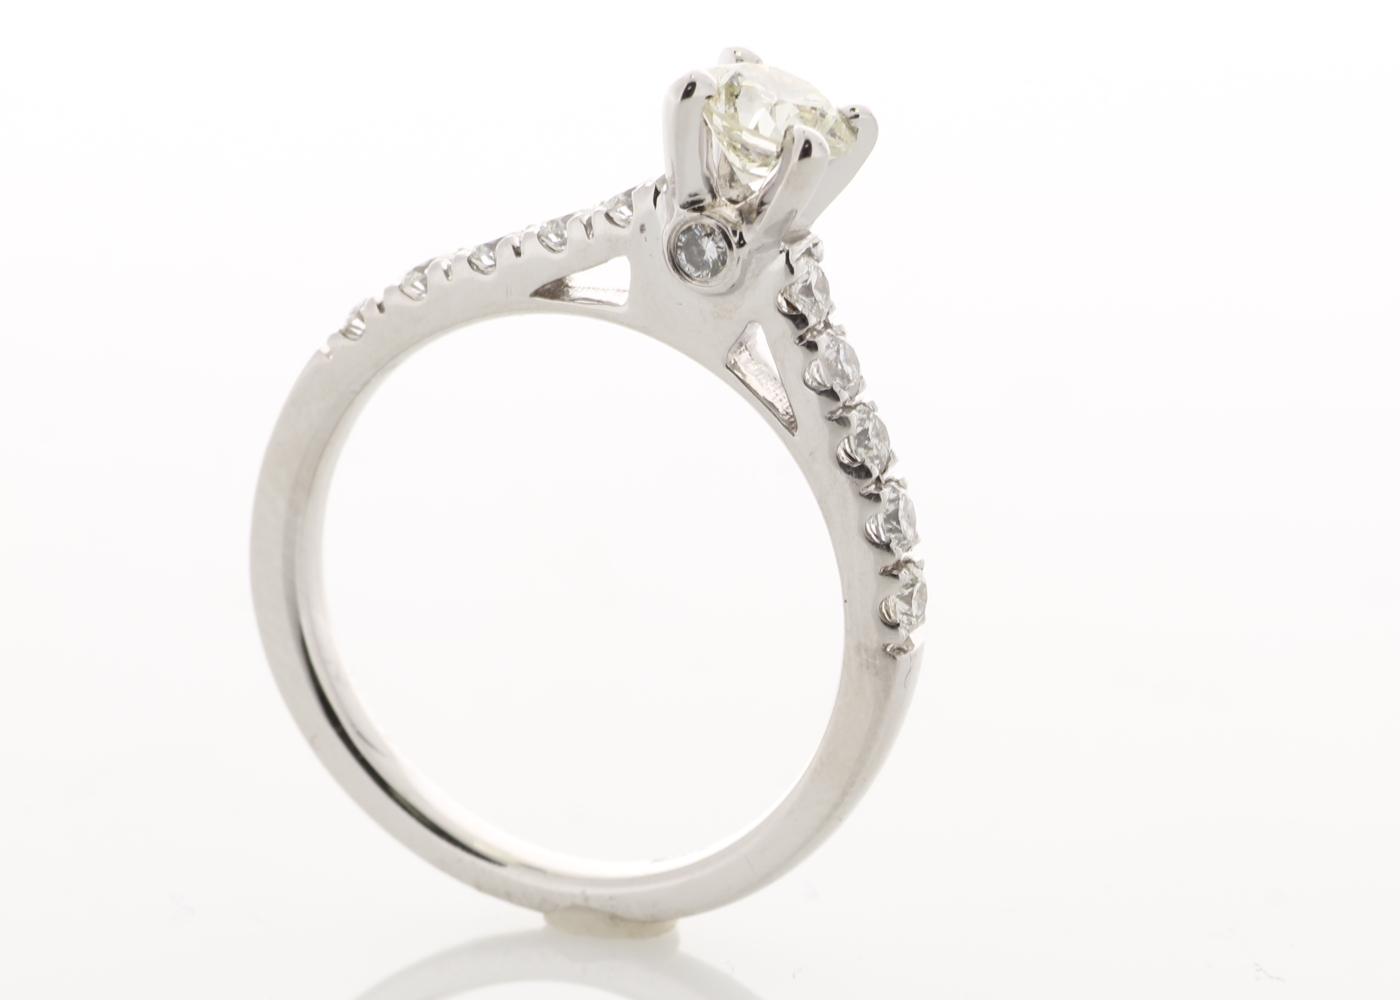 18k White Gold Stone Set Shoulders Diamond Ring 0.91 Carats - Image 2 of 5